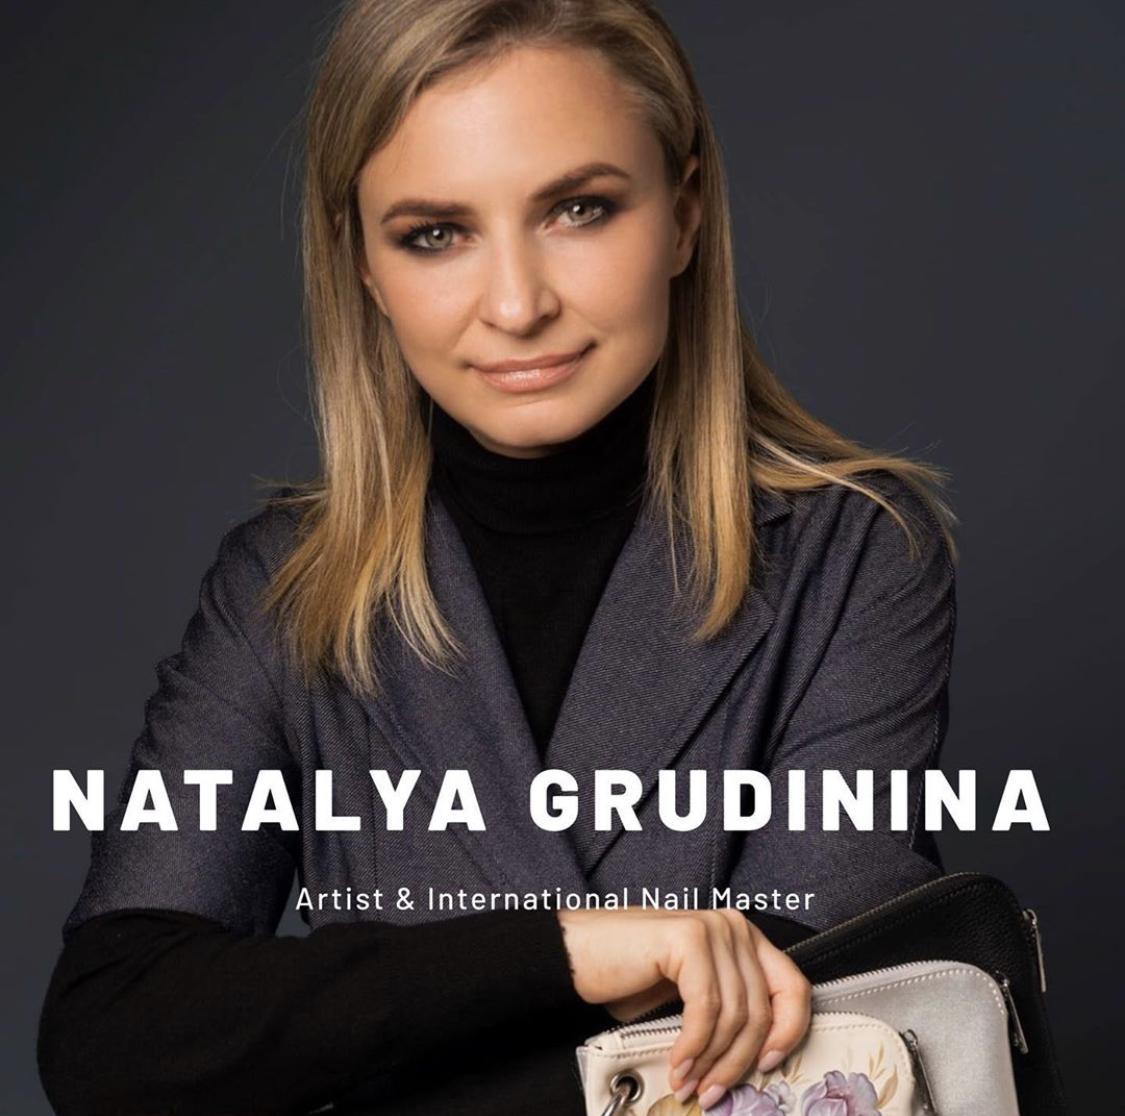 NATALYA GRUDININA